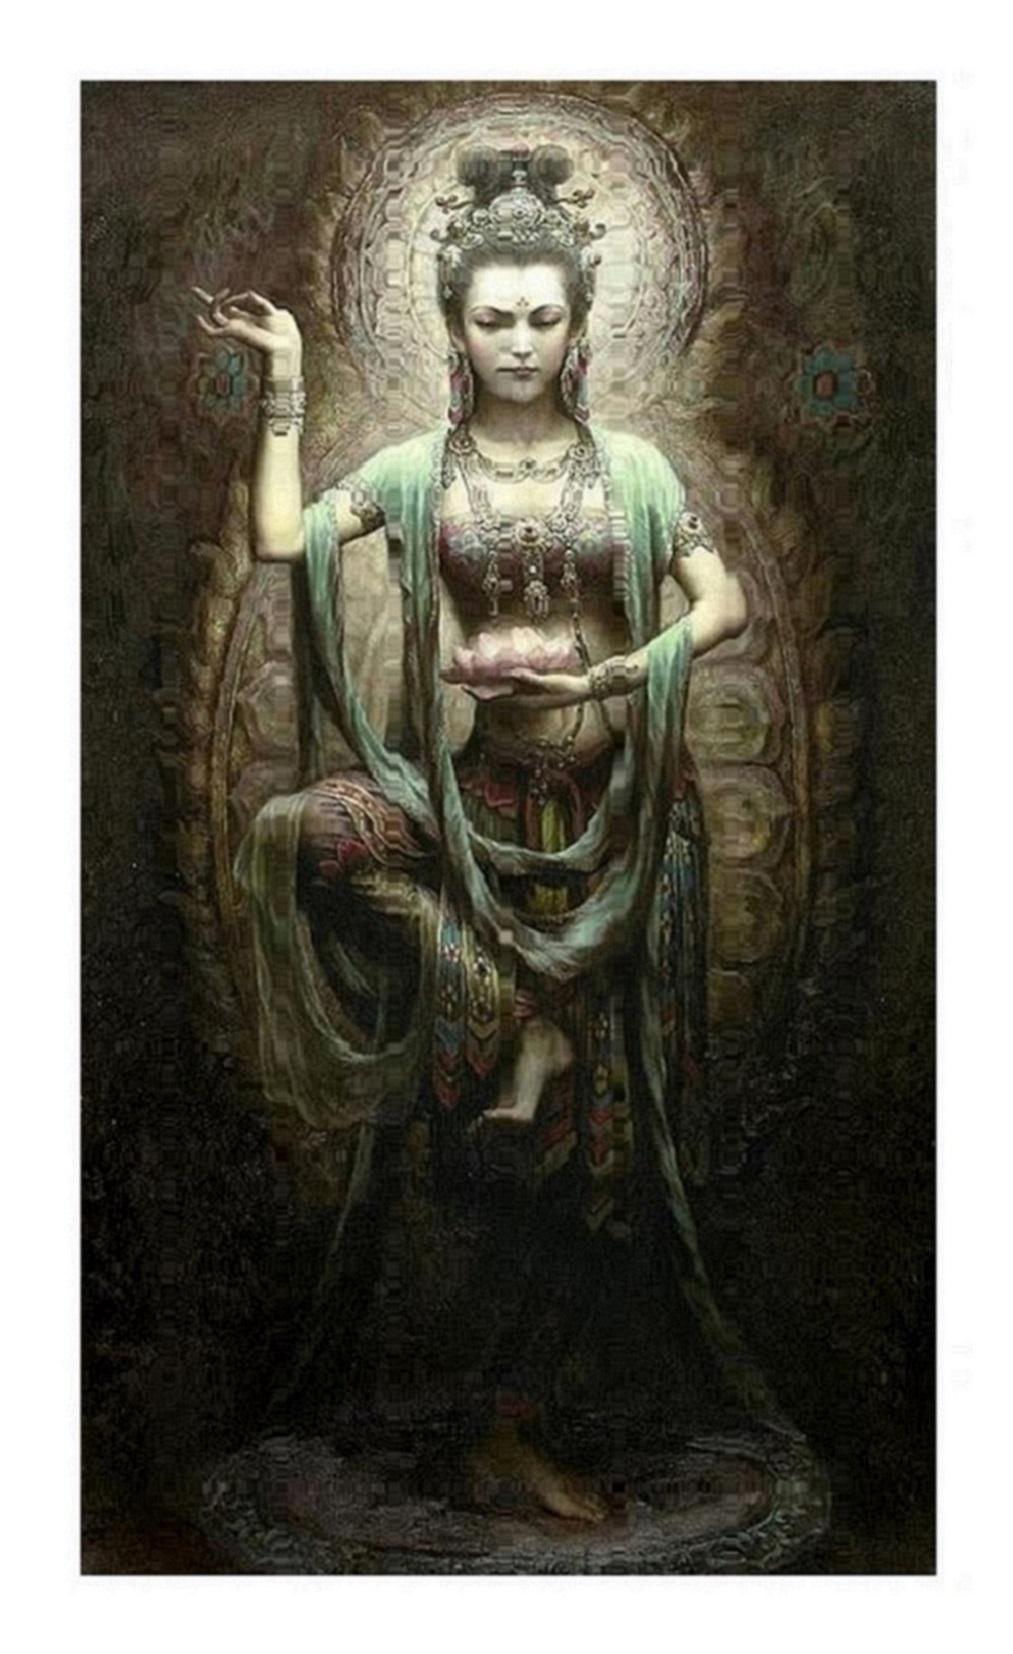 A74 gerahmt Ungerahmt chinesische Dunhuang Kwan-yin Göttin Hohe Qualität handworte HD Print Porträt Kunst Ölgemälde auf Leinwand Multi Größen D40